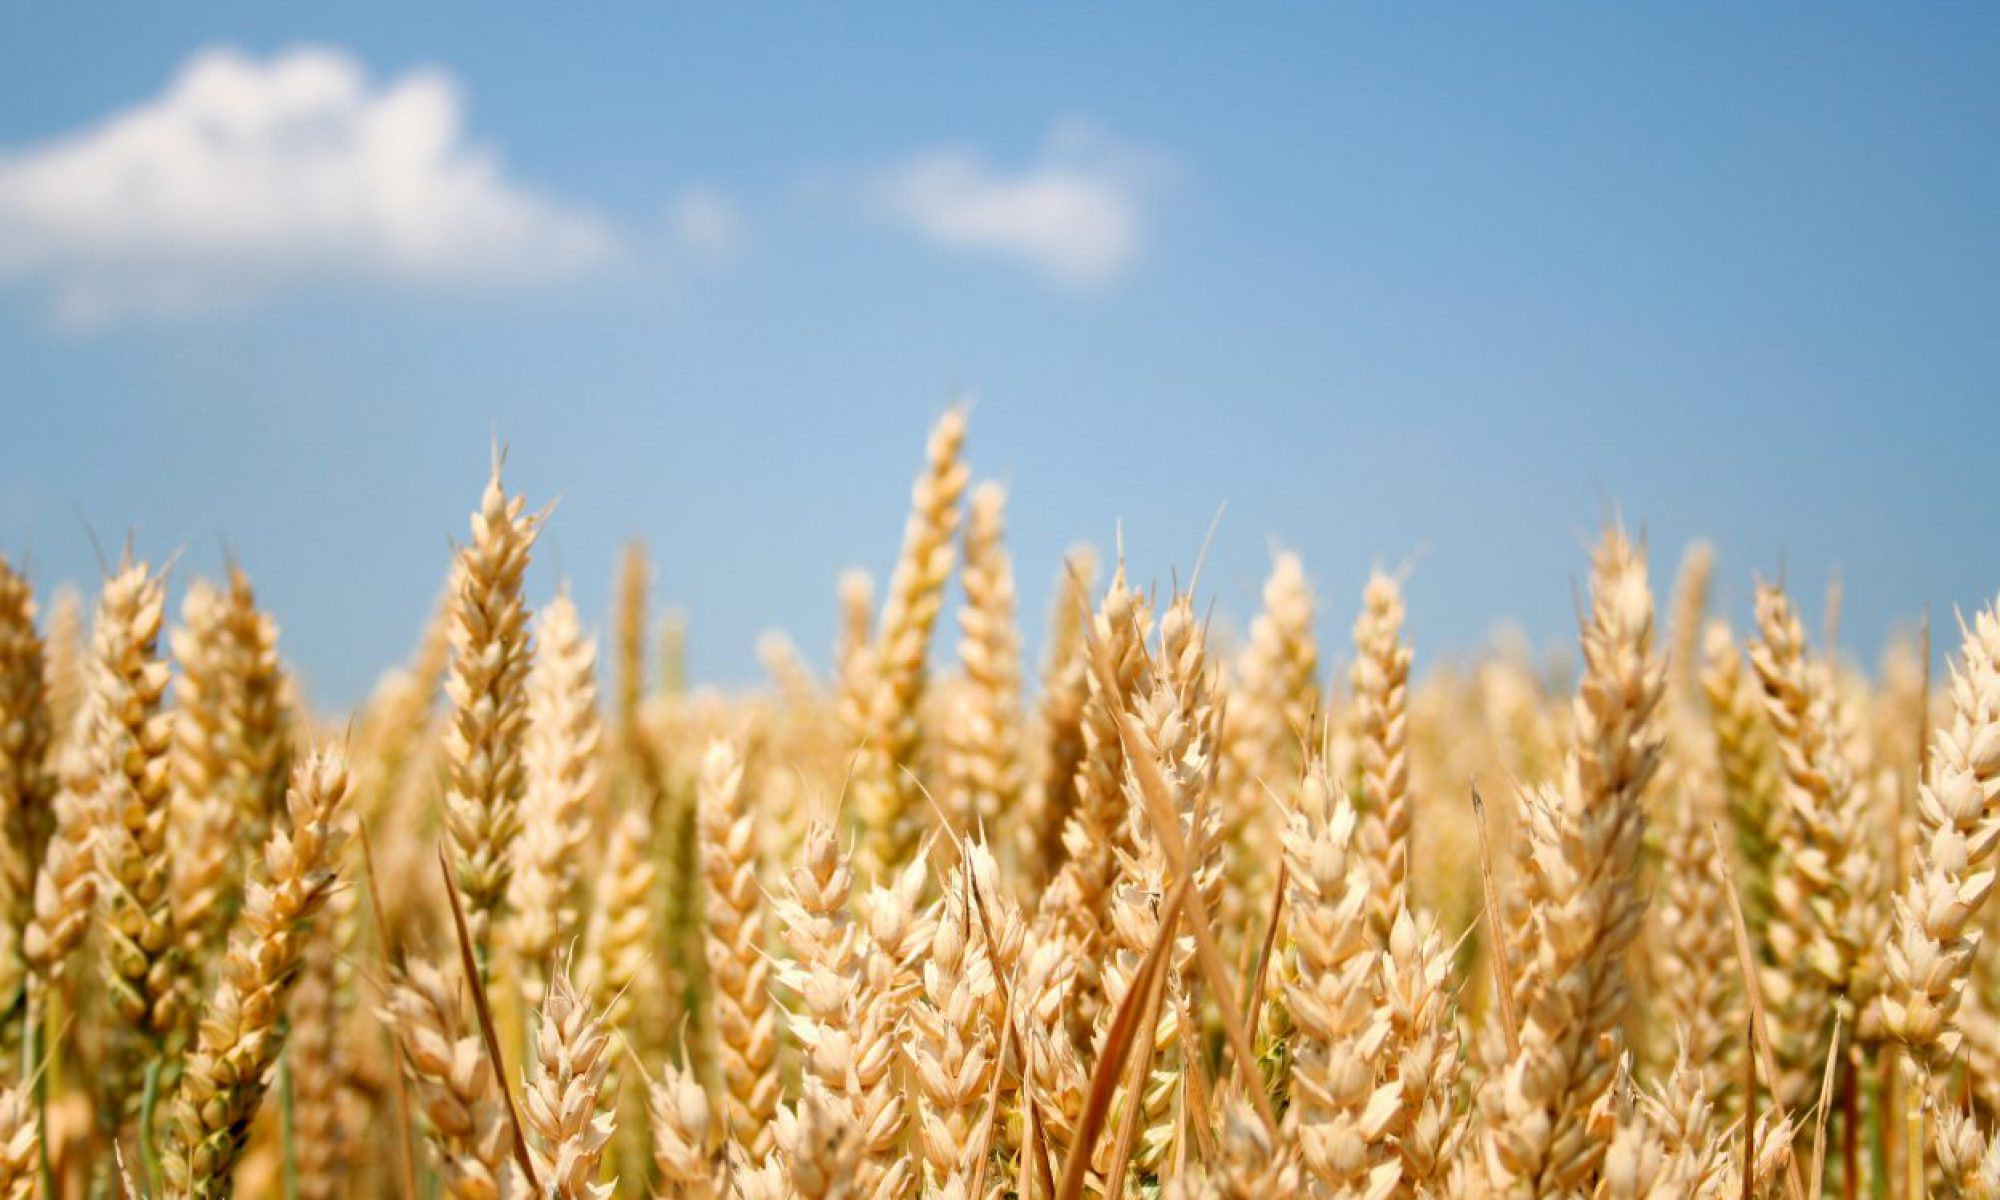 A corn of wheat